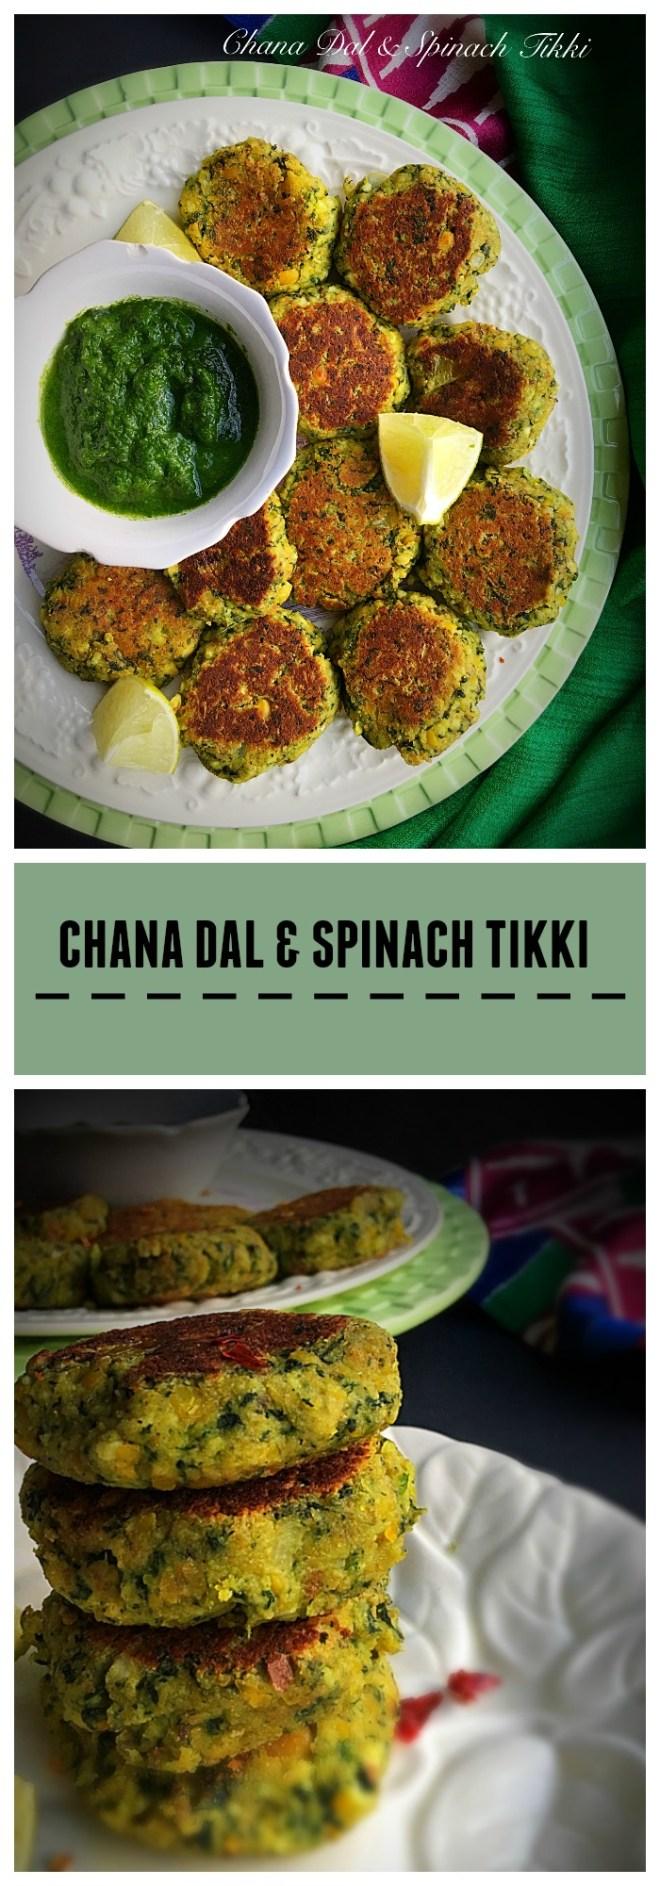 chana-dal-and-spinach-tikki